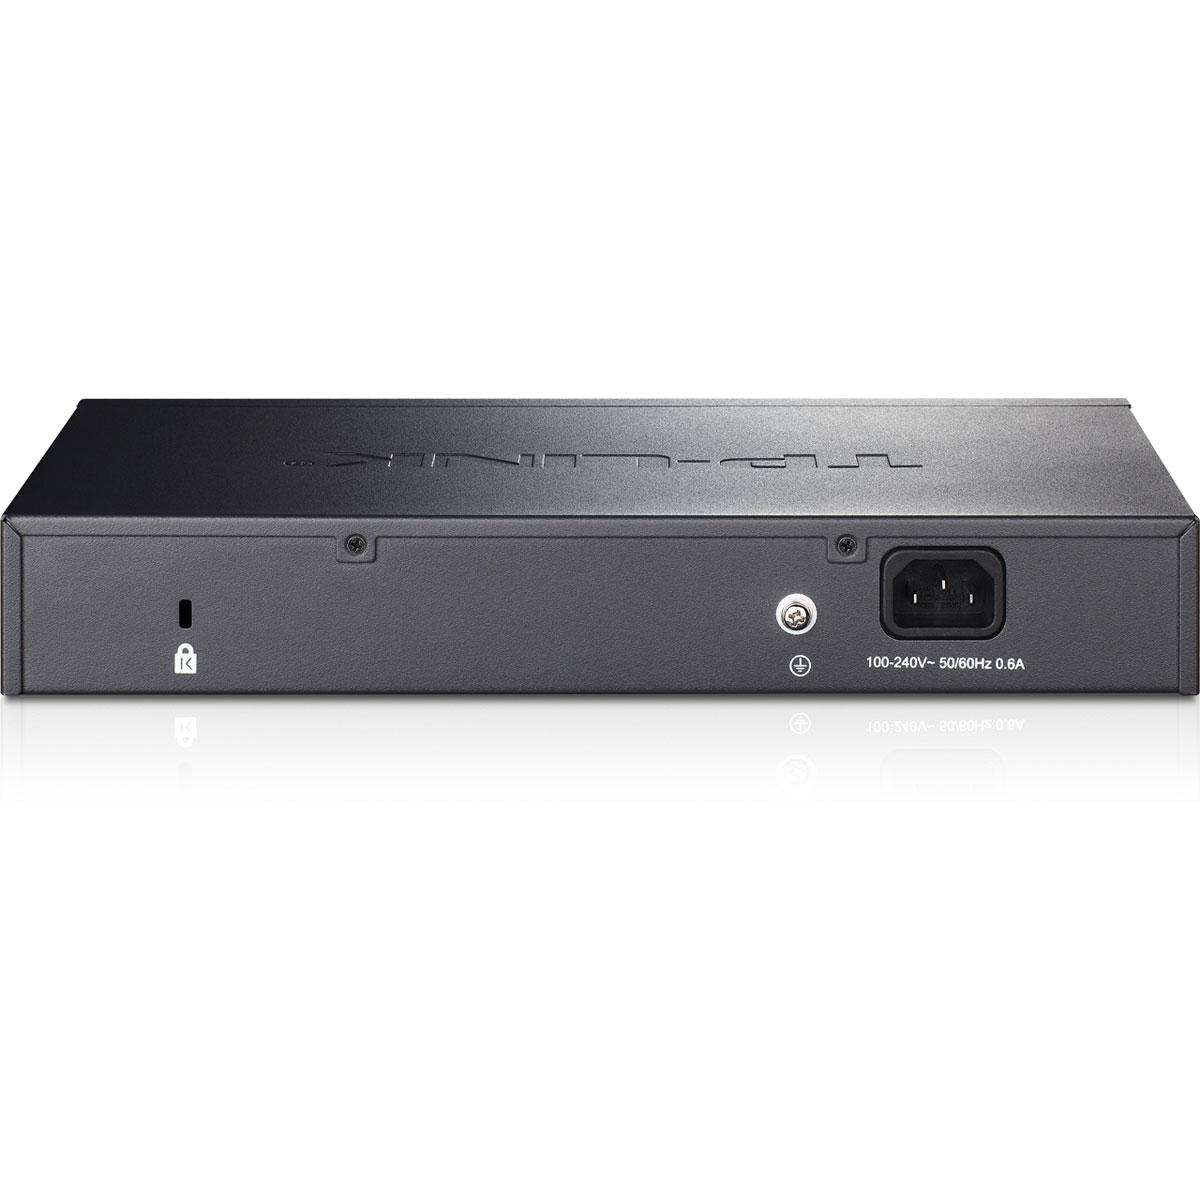 TP-Link Safestream TL-ER6020 (TL-ER6020) - Achat / Vente Routeur sur Cybertek.fr - 1